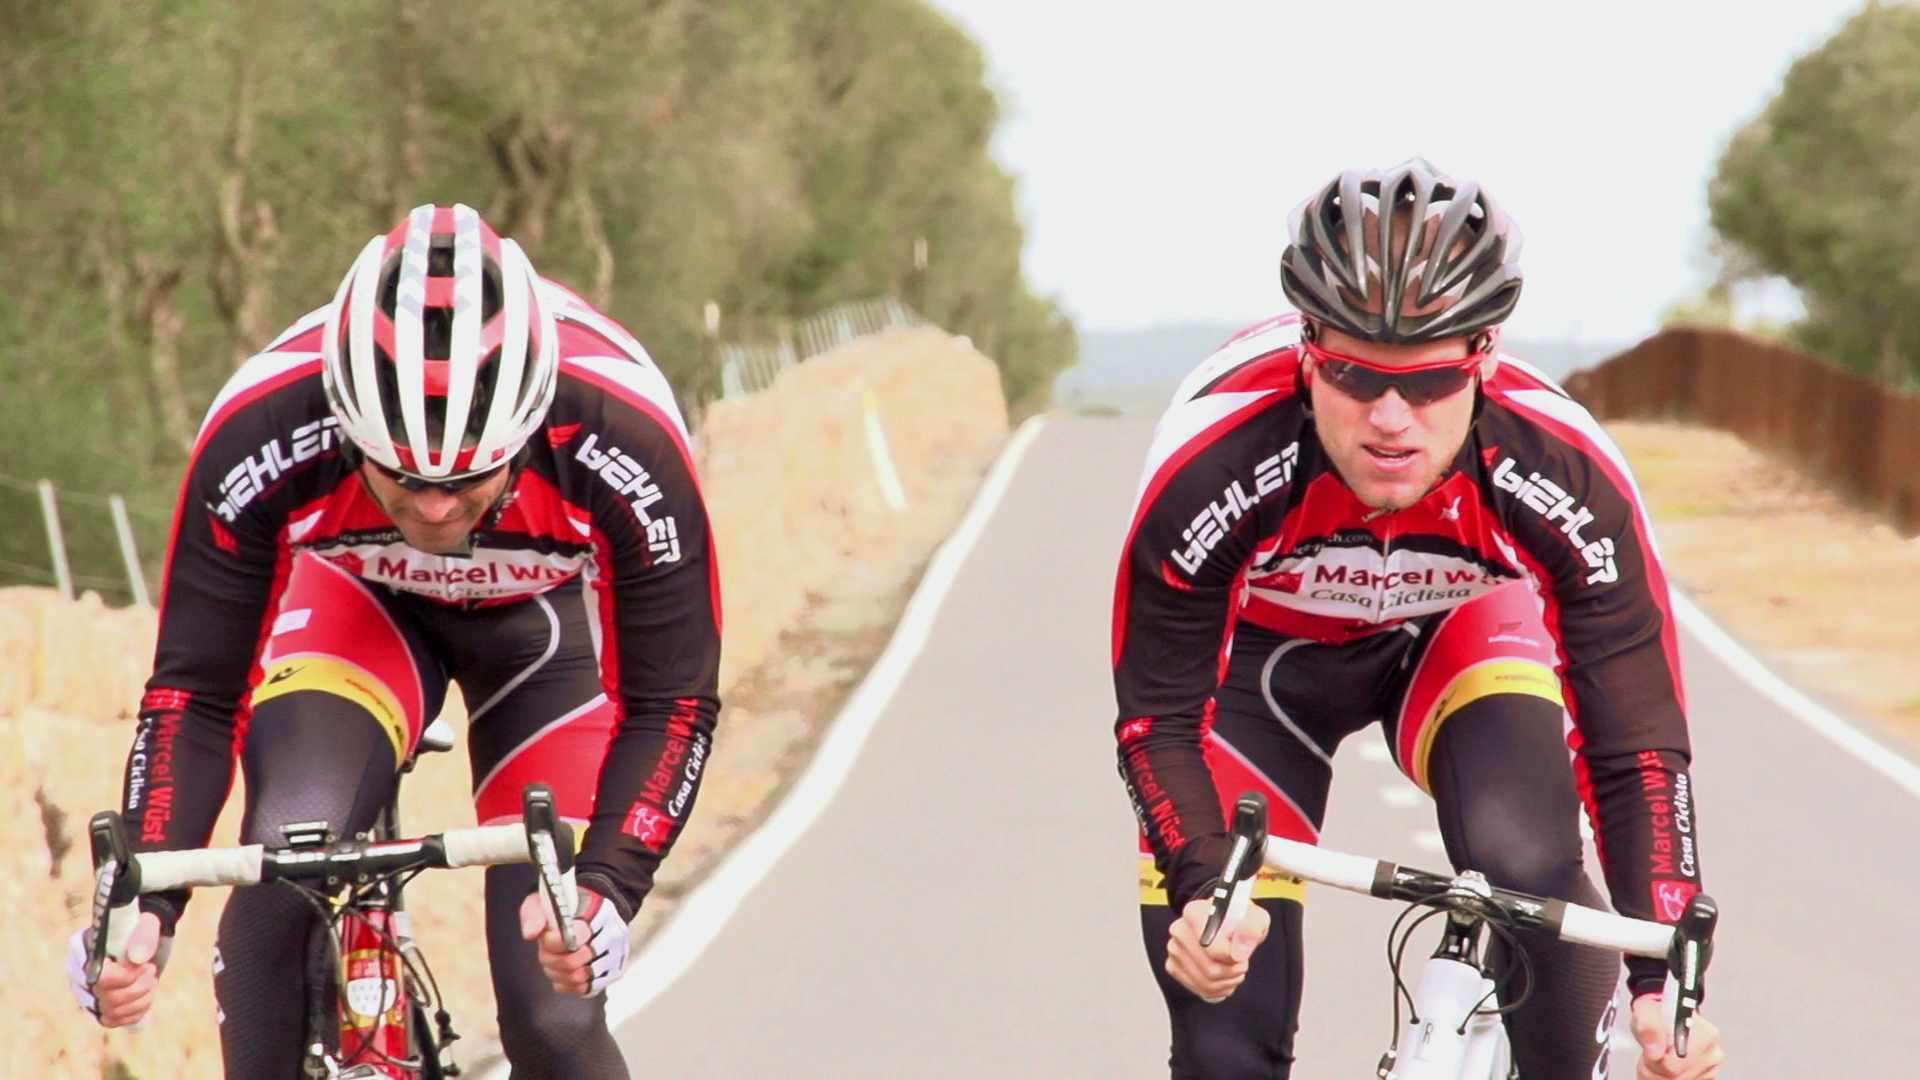 How to sprint like Marcel Wüst